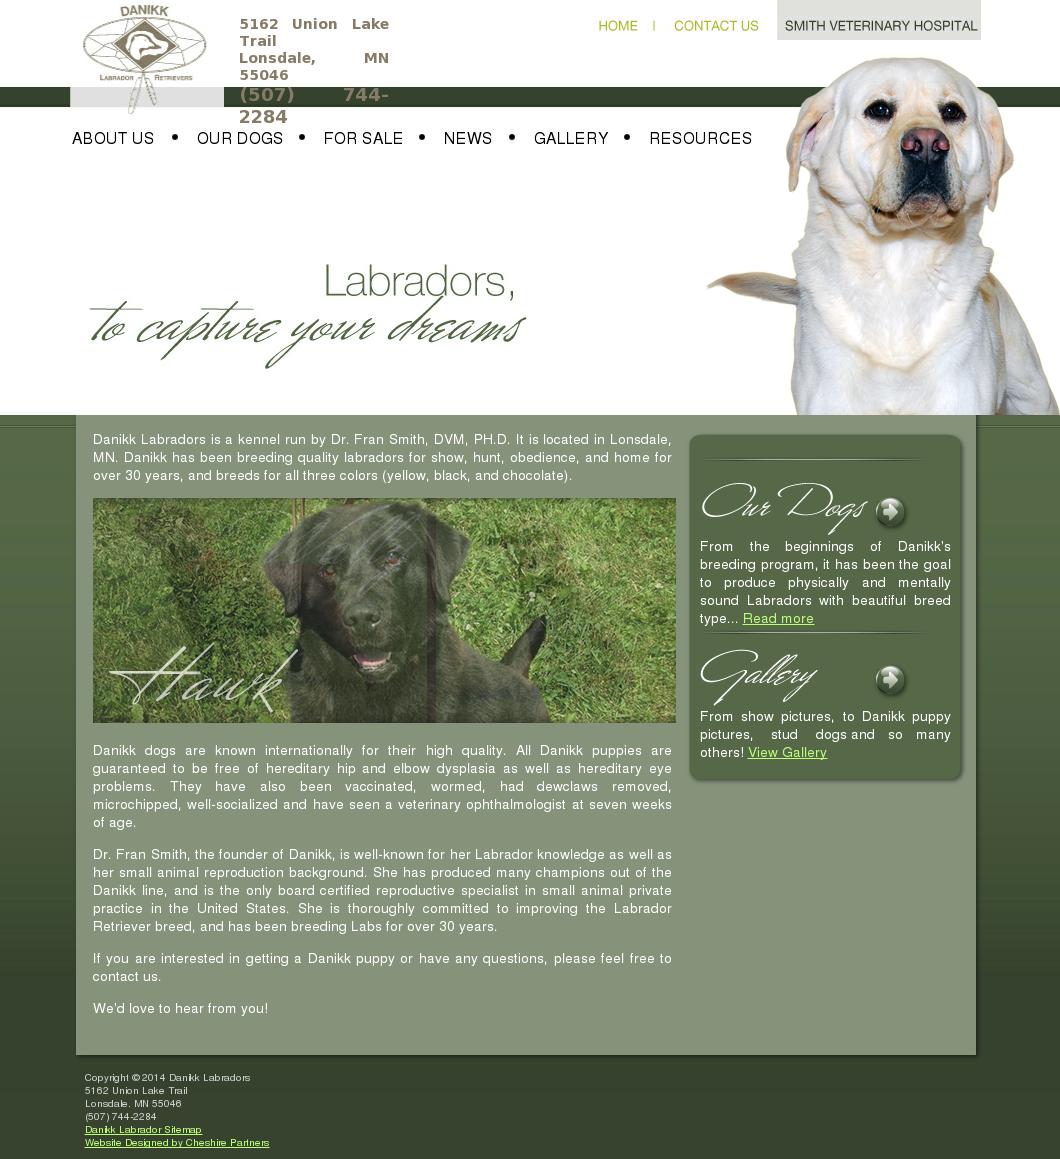 Danikk Labradors Competitors, Revenue and Employees - Owler Company